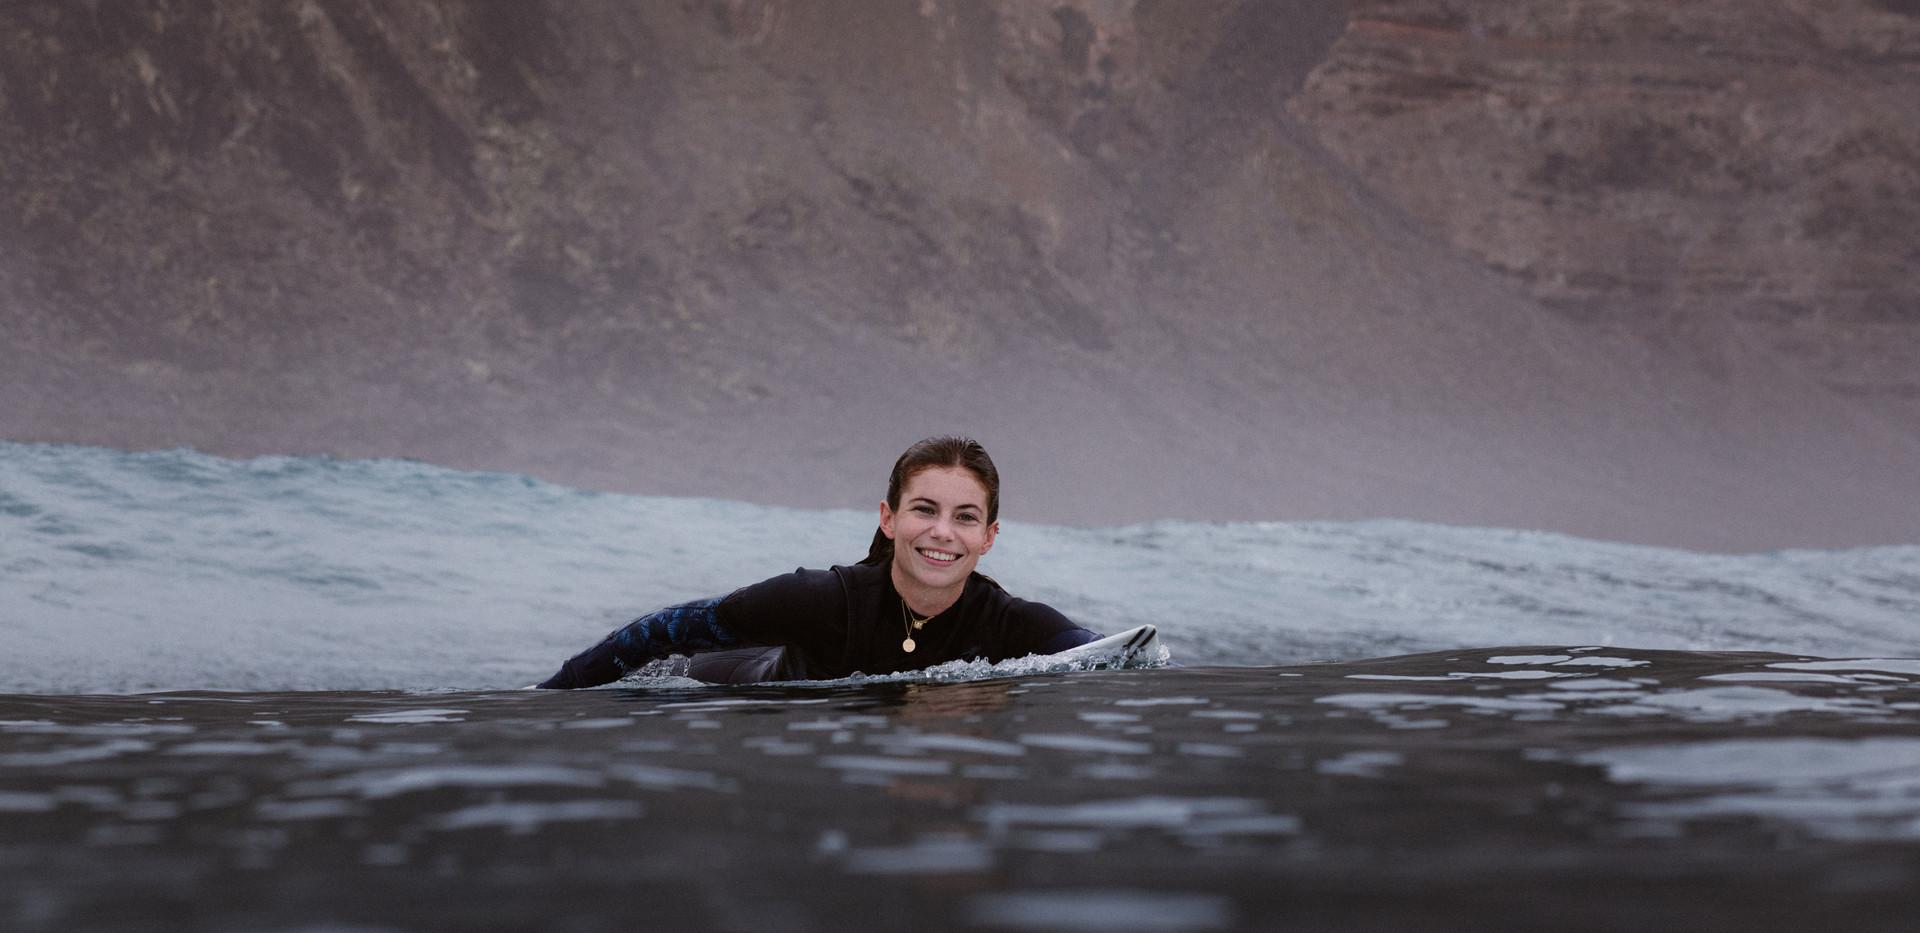 Surf Canary Islands